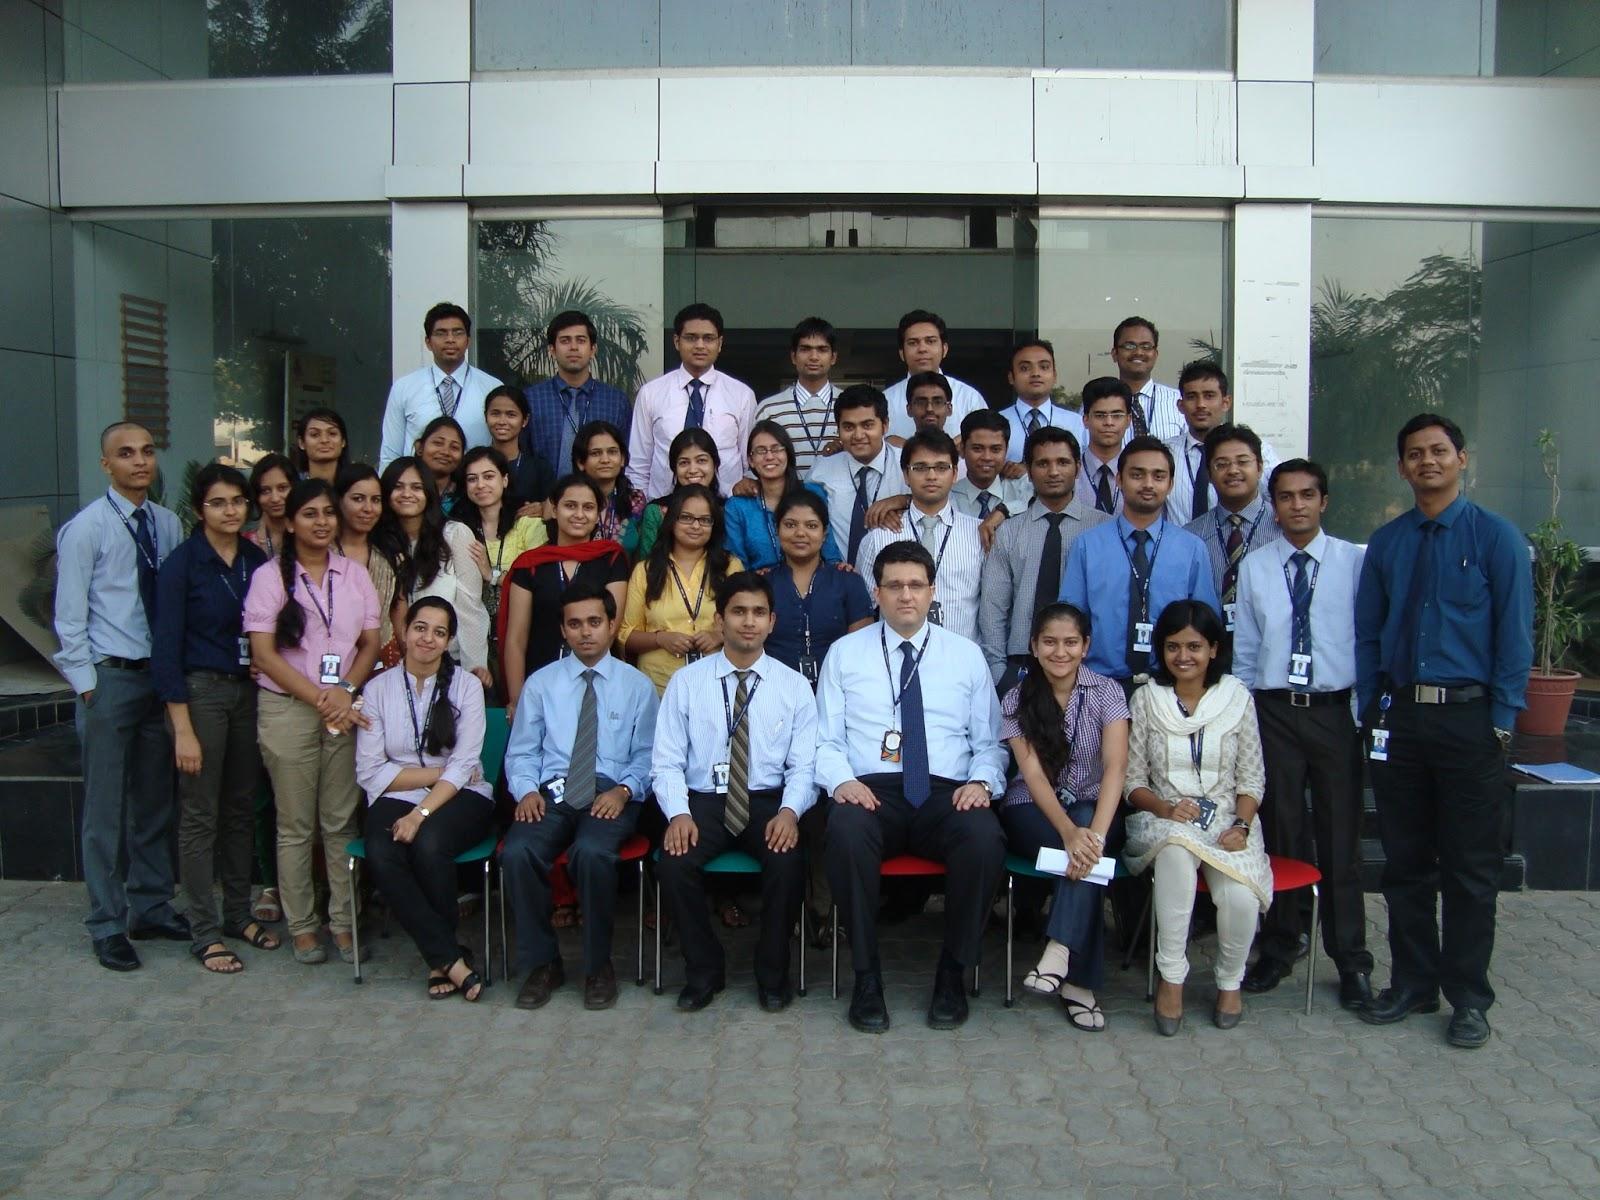 Studio Apartment Gandhinagar Infocity ilp gandhinagar : tower 3, tcs ilp centre | trisha